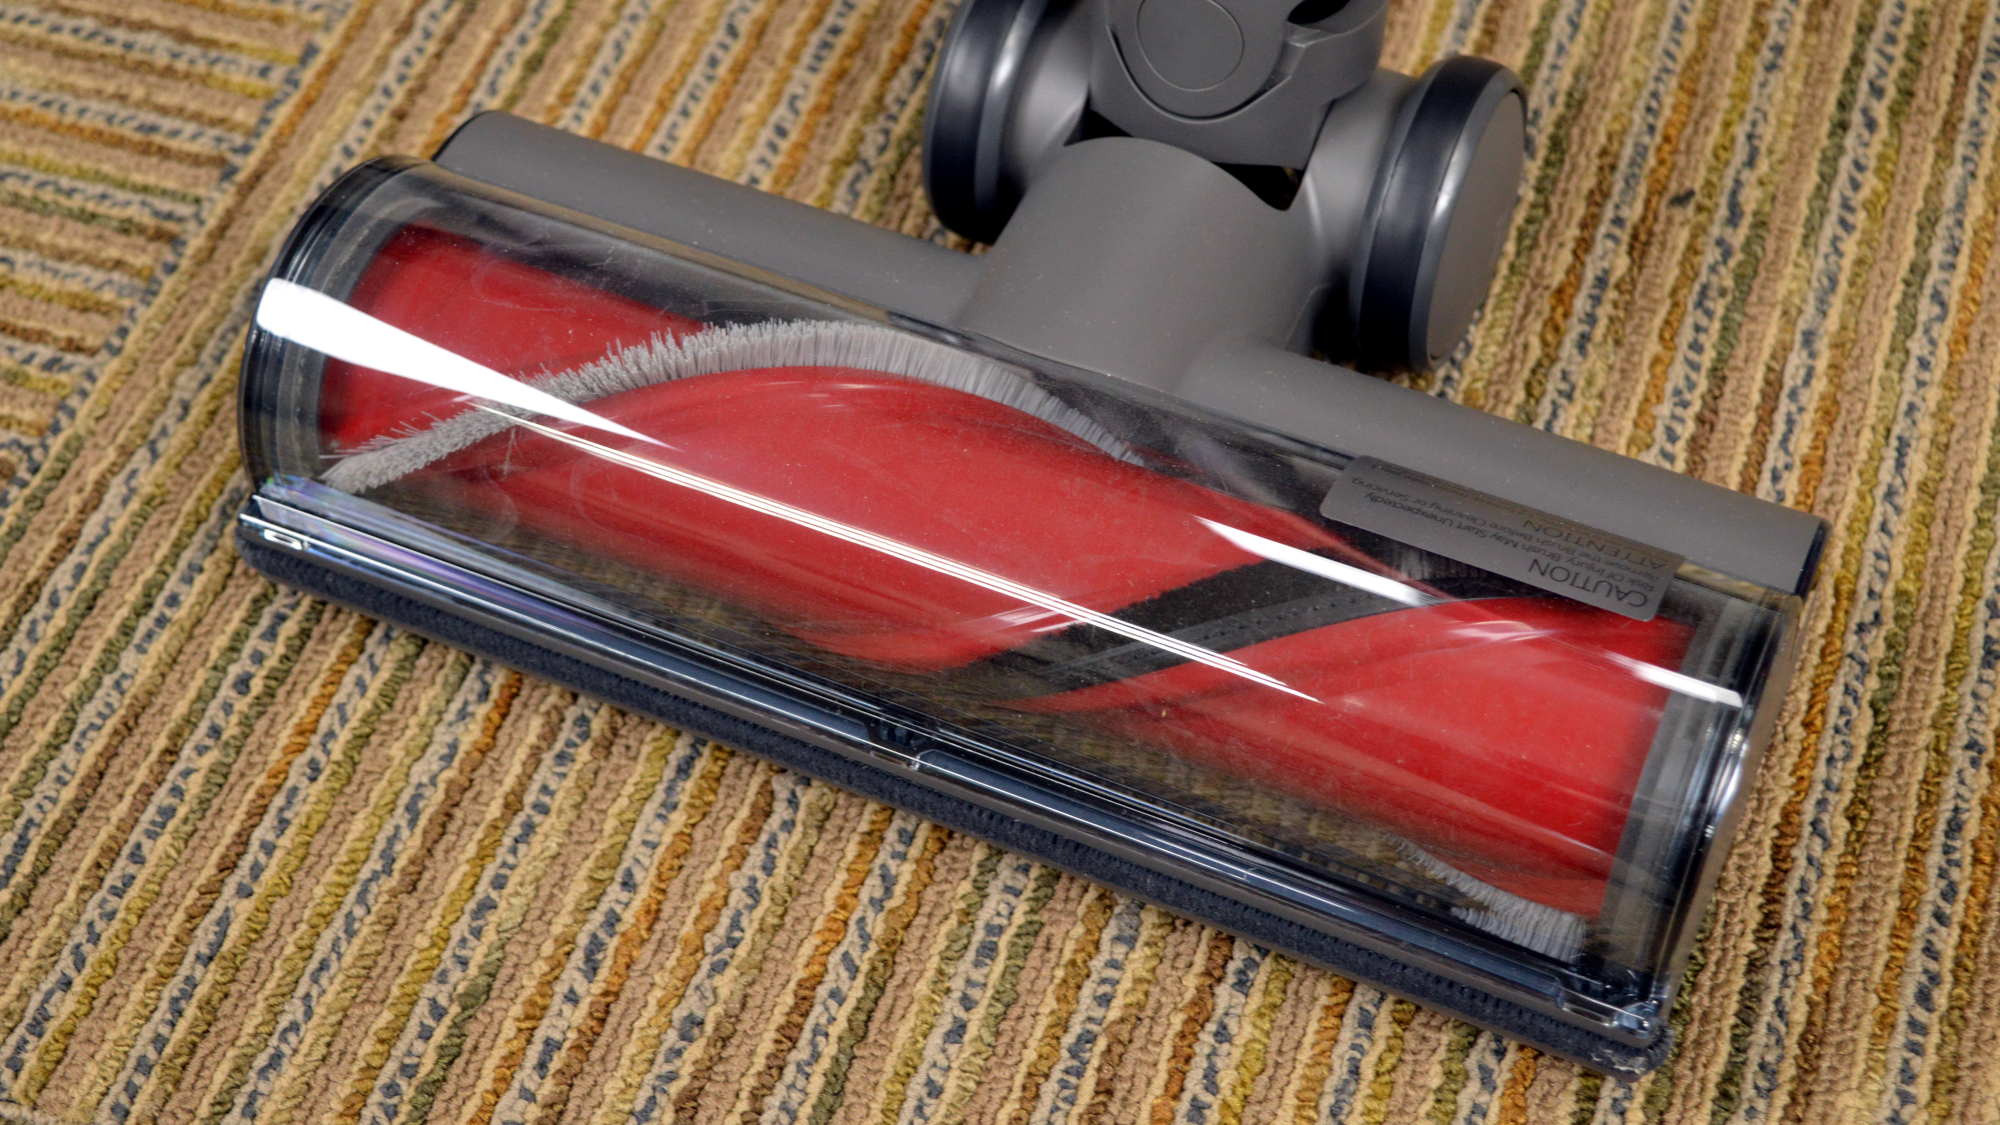 Roborock H7 Cordless Vacuum Head